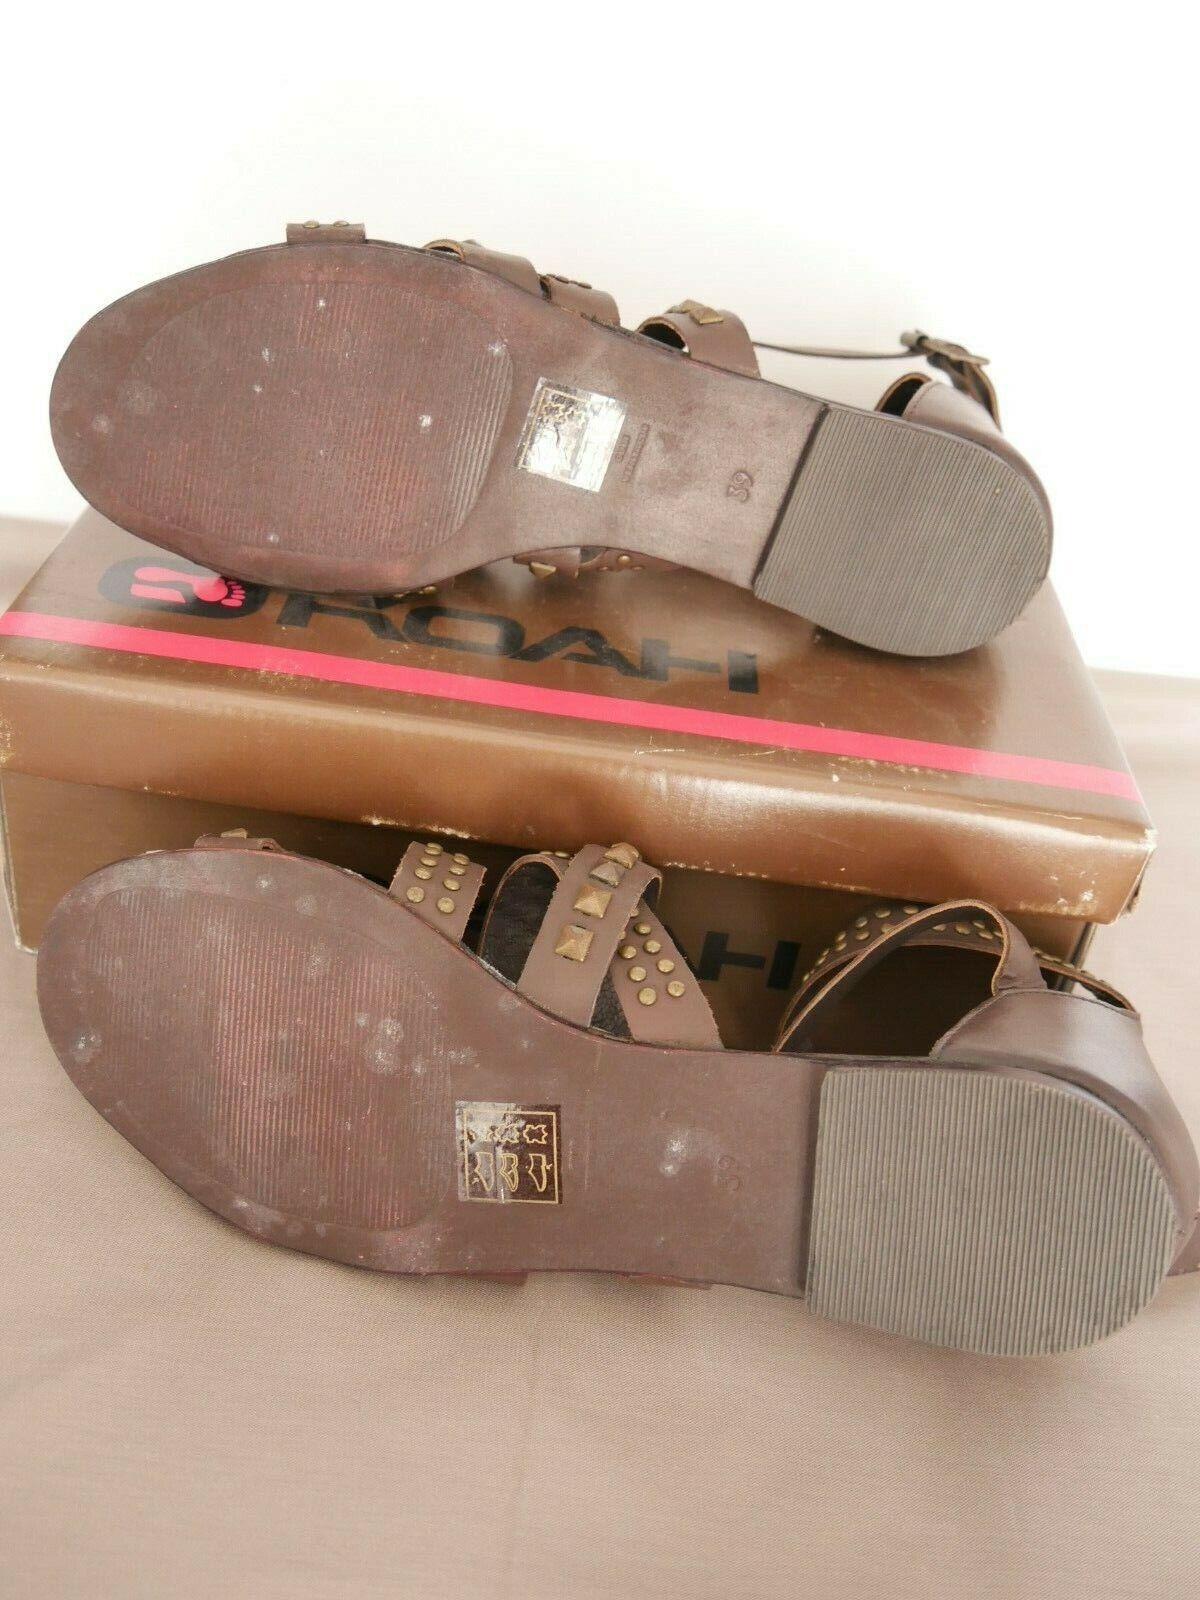 Koah Koah Koah sandales rock Marronee chocolat 39 à clous scarpe nu pieds scarpe 0f9dd3